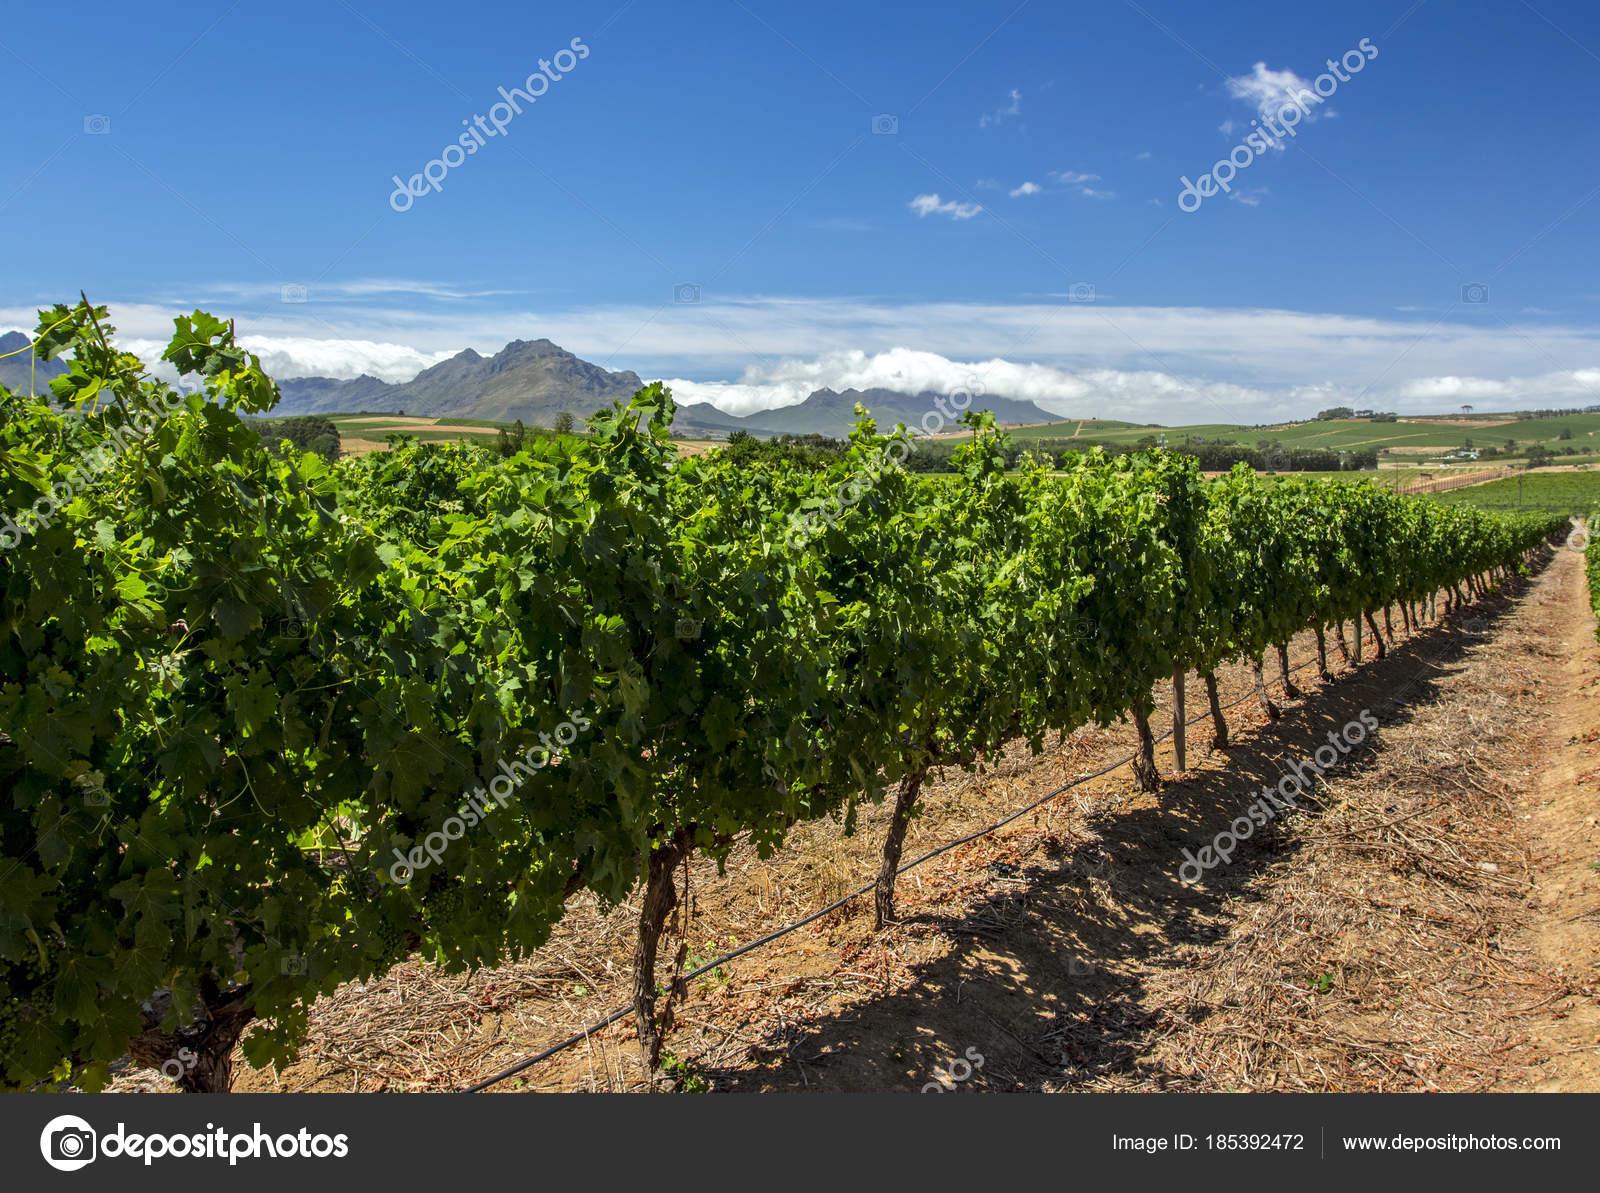 Azienda agricola uva citt del capo sud africa foto for Sud africa immagini